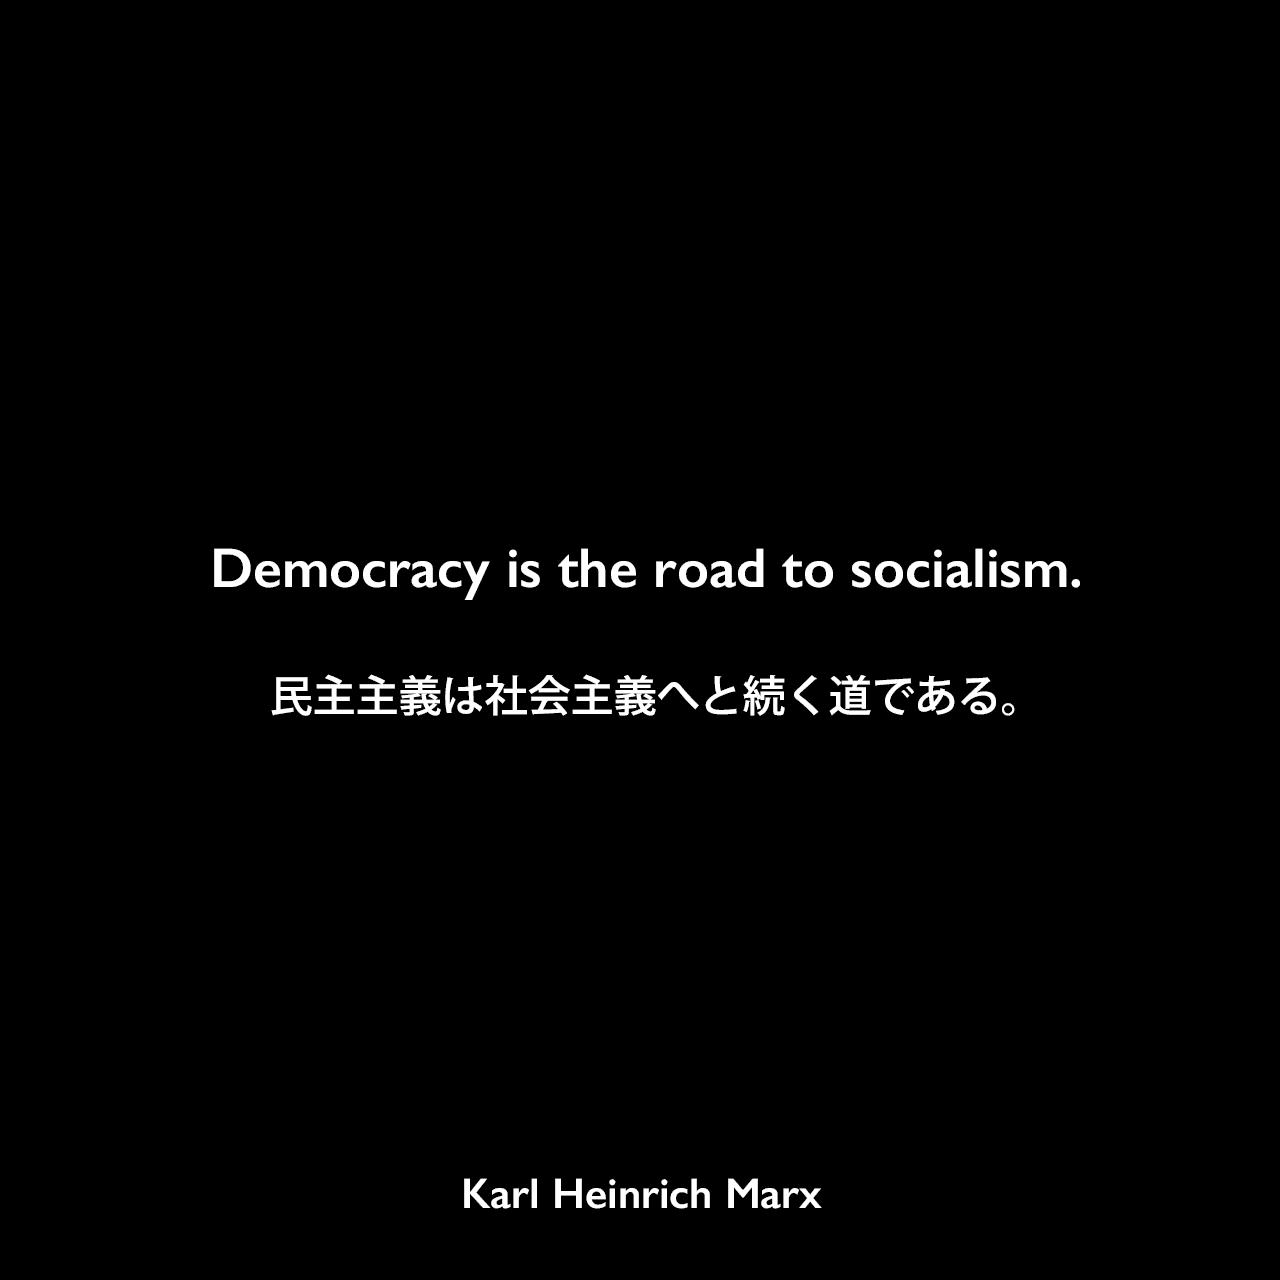 Democracy is the road to socialism.民主主義は社会主義へと続く道である。Karl Heinrich Marx